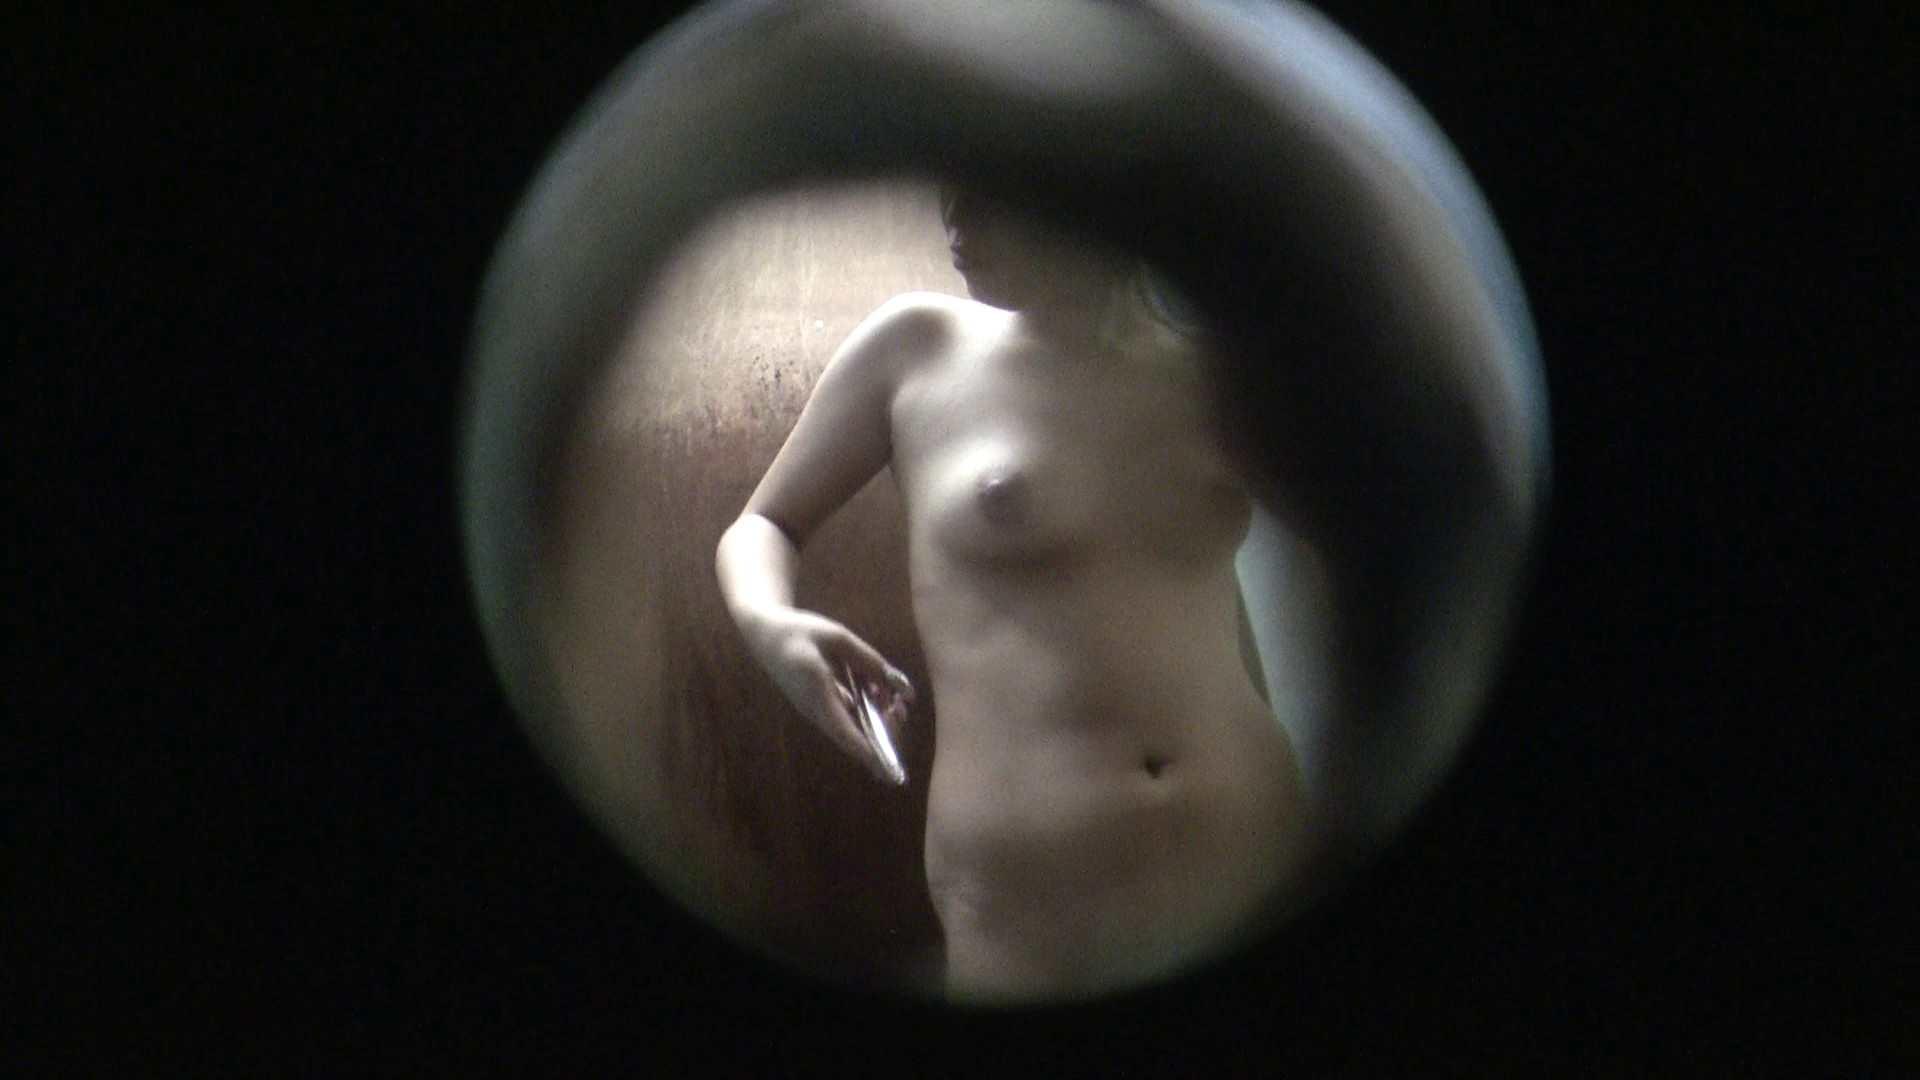 NO.03 ムッチリ色白ボディーに少し大きな乳輪 美乳 おまんこ動画流出 90枚 73